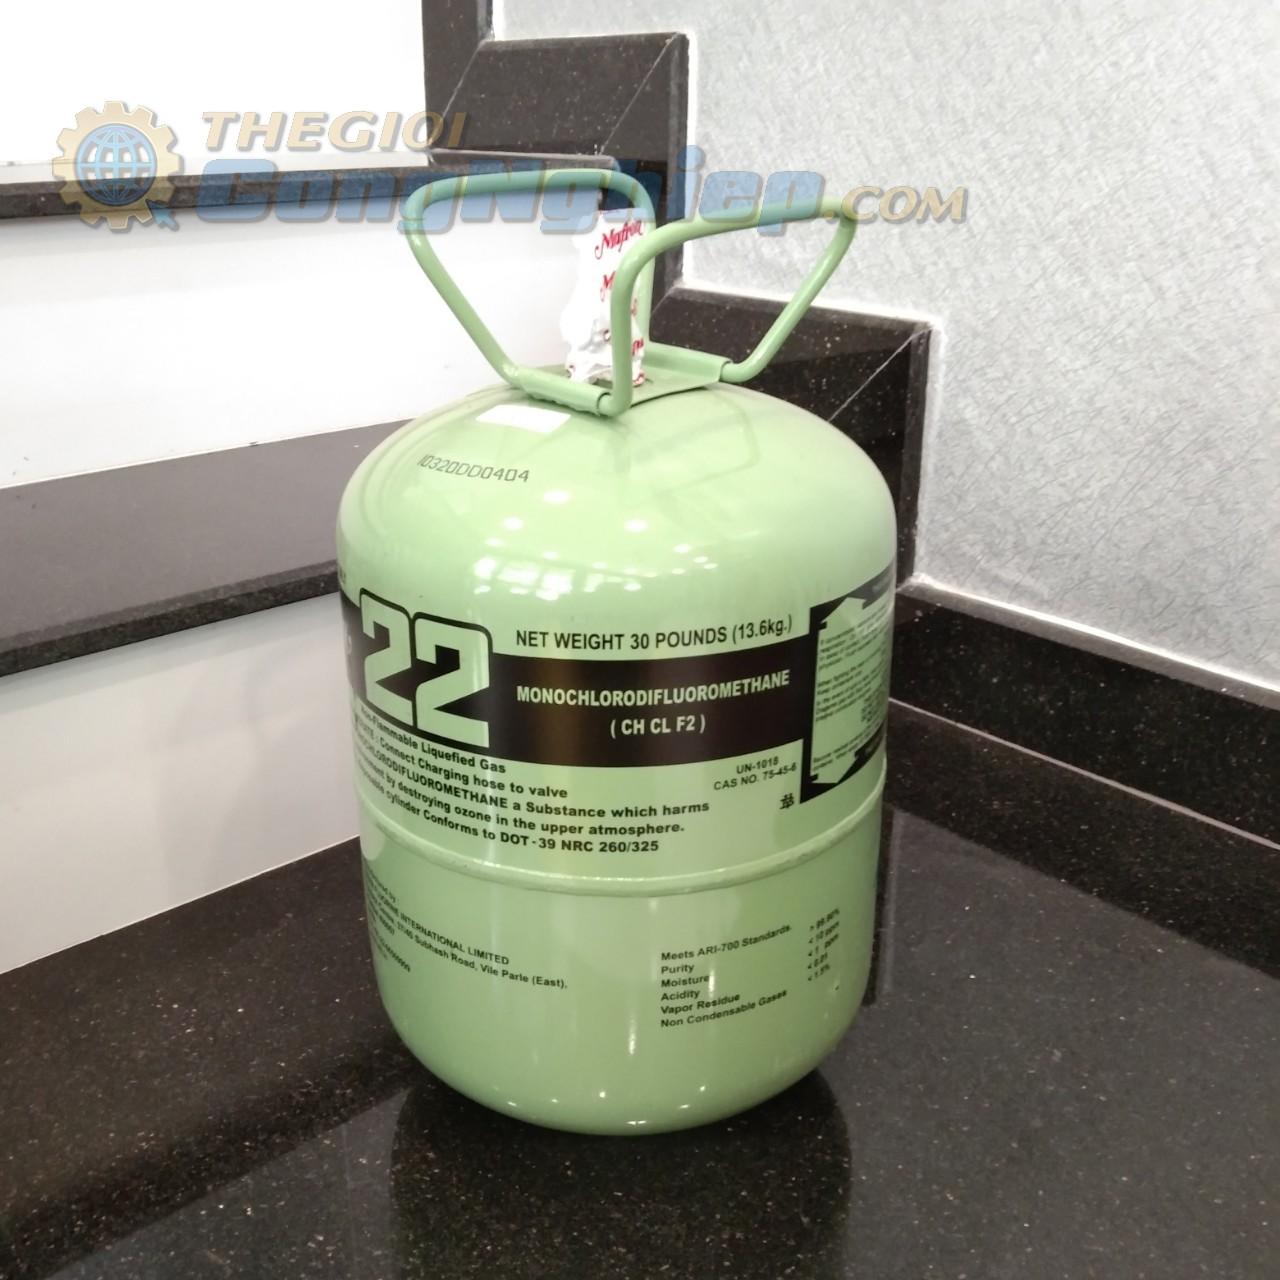 Gas lạnh, ga lạnh   R22 (13.6 kg) MAFRON